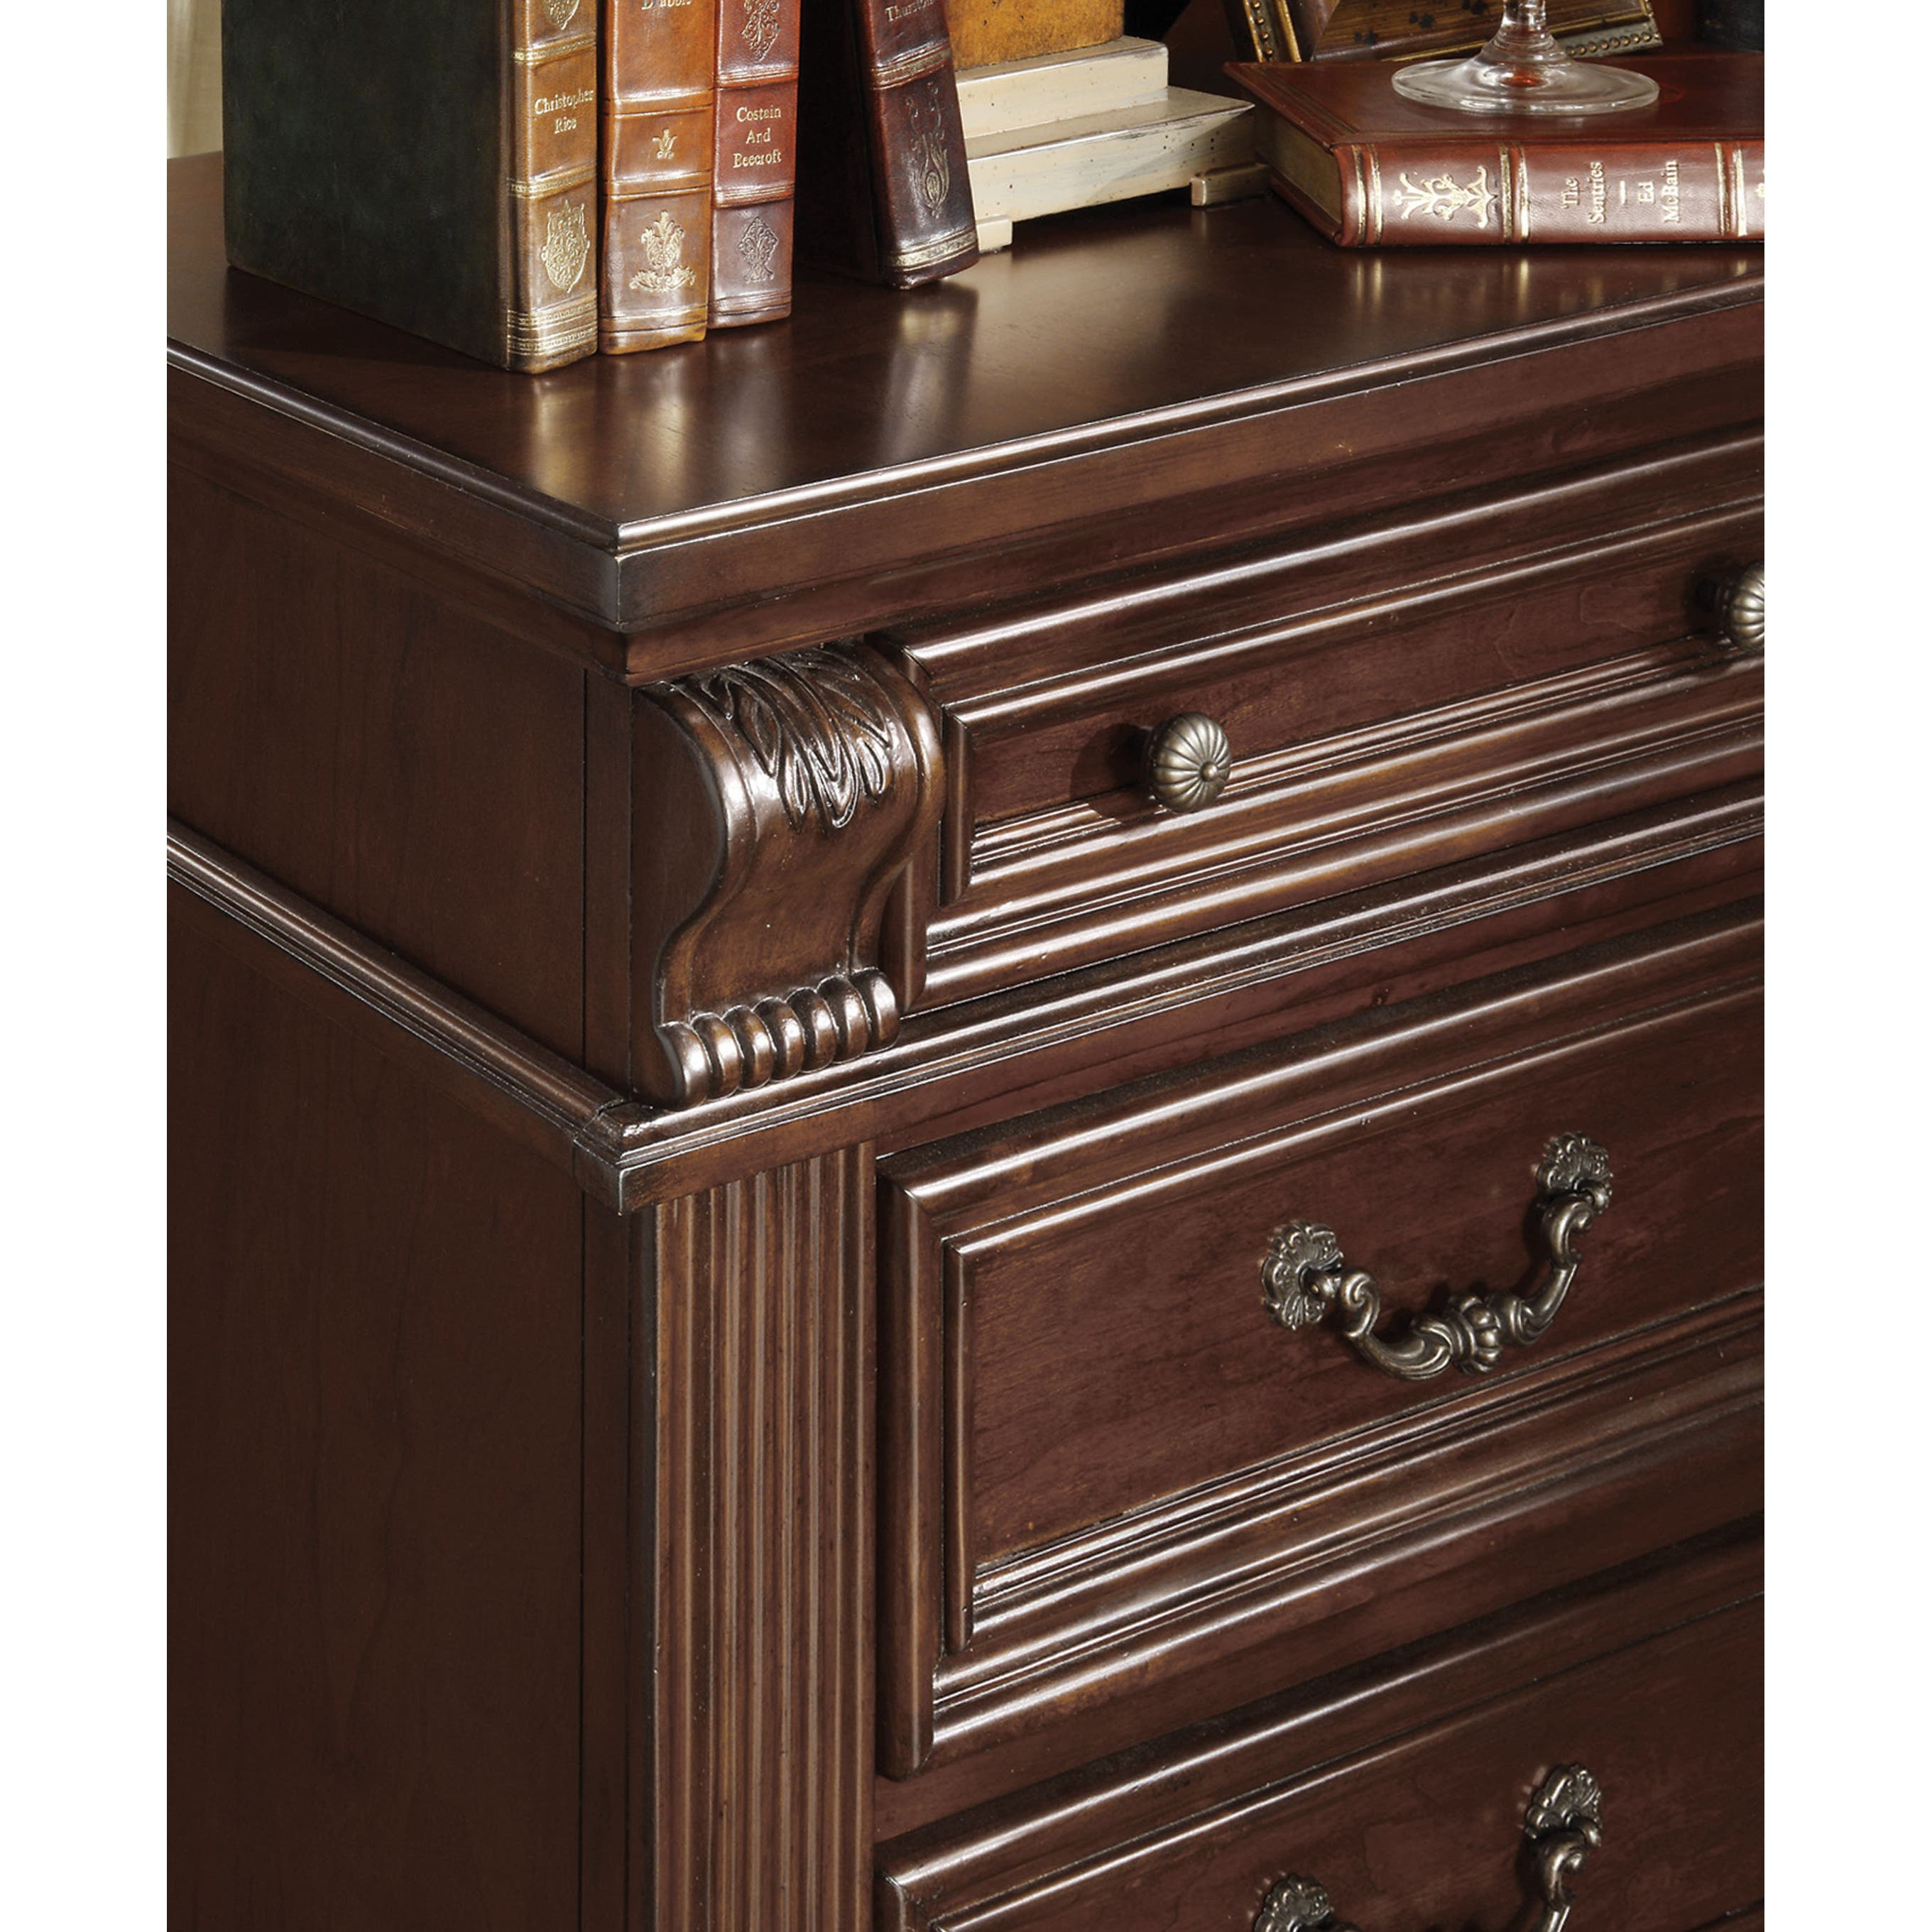 Great Deals On Furniture Online: Buy Bedroom Sets Online At Overstock